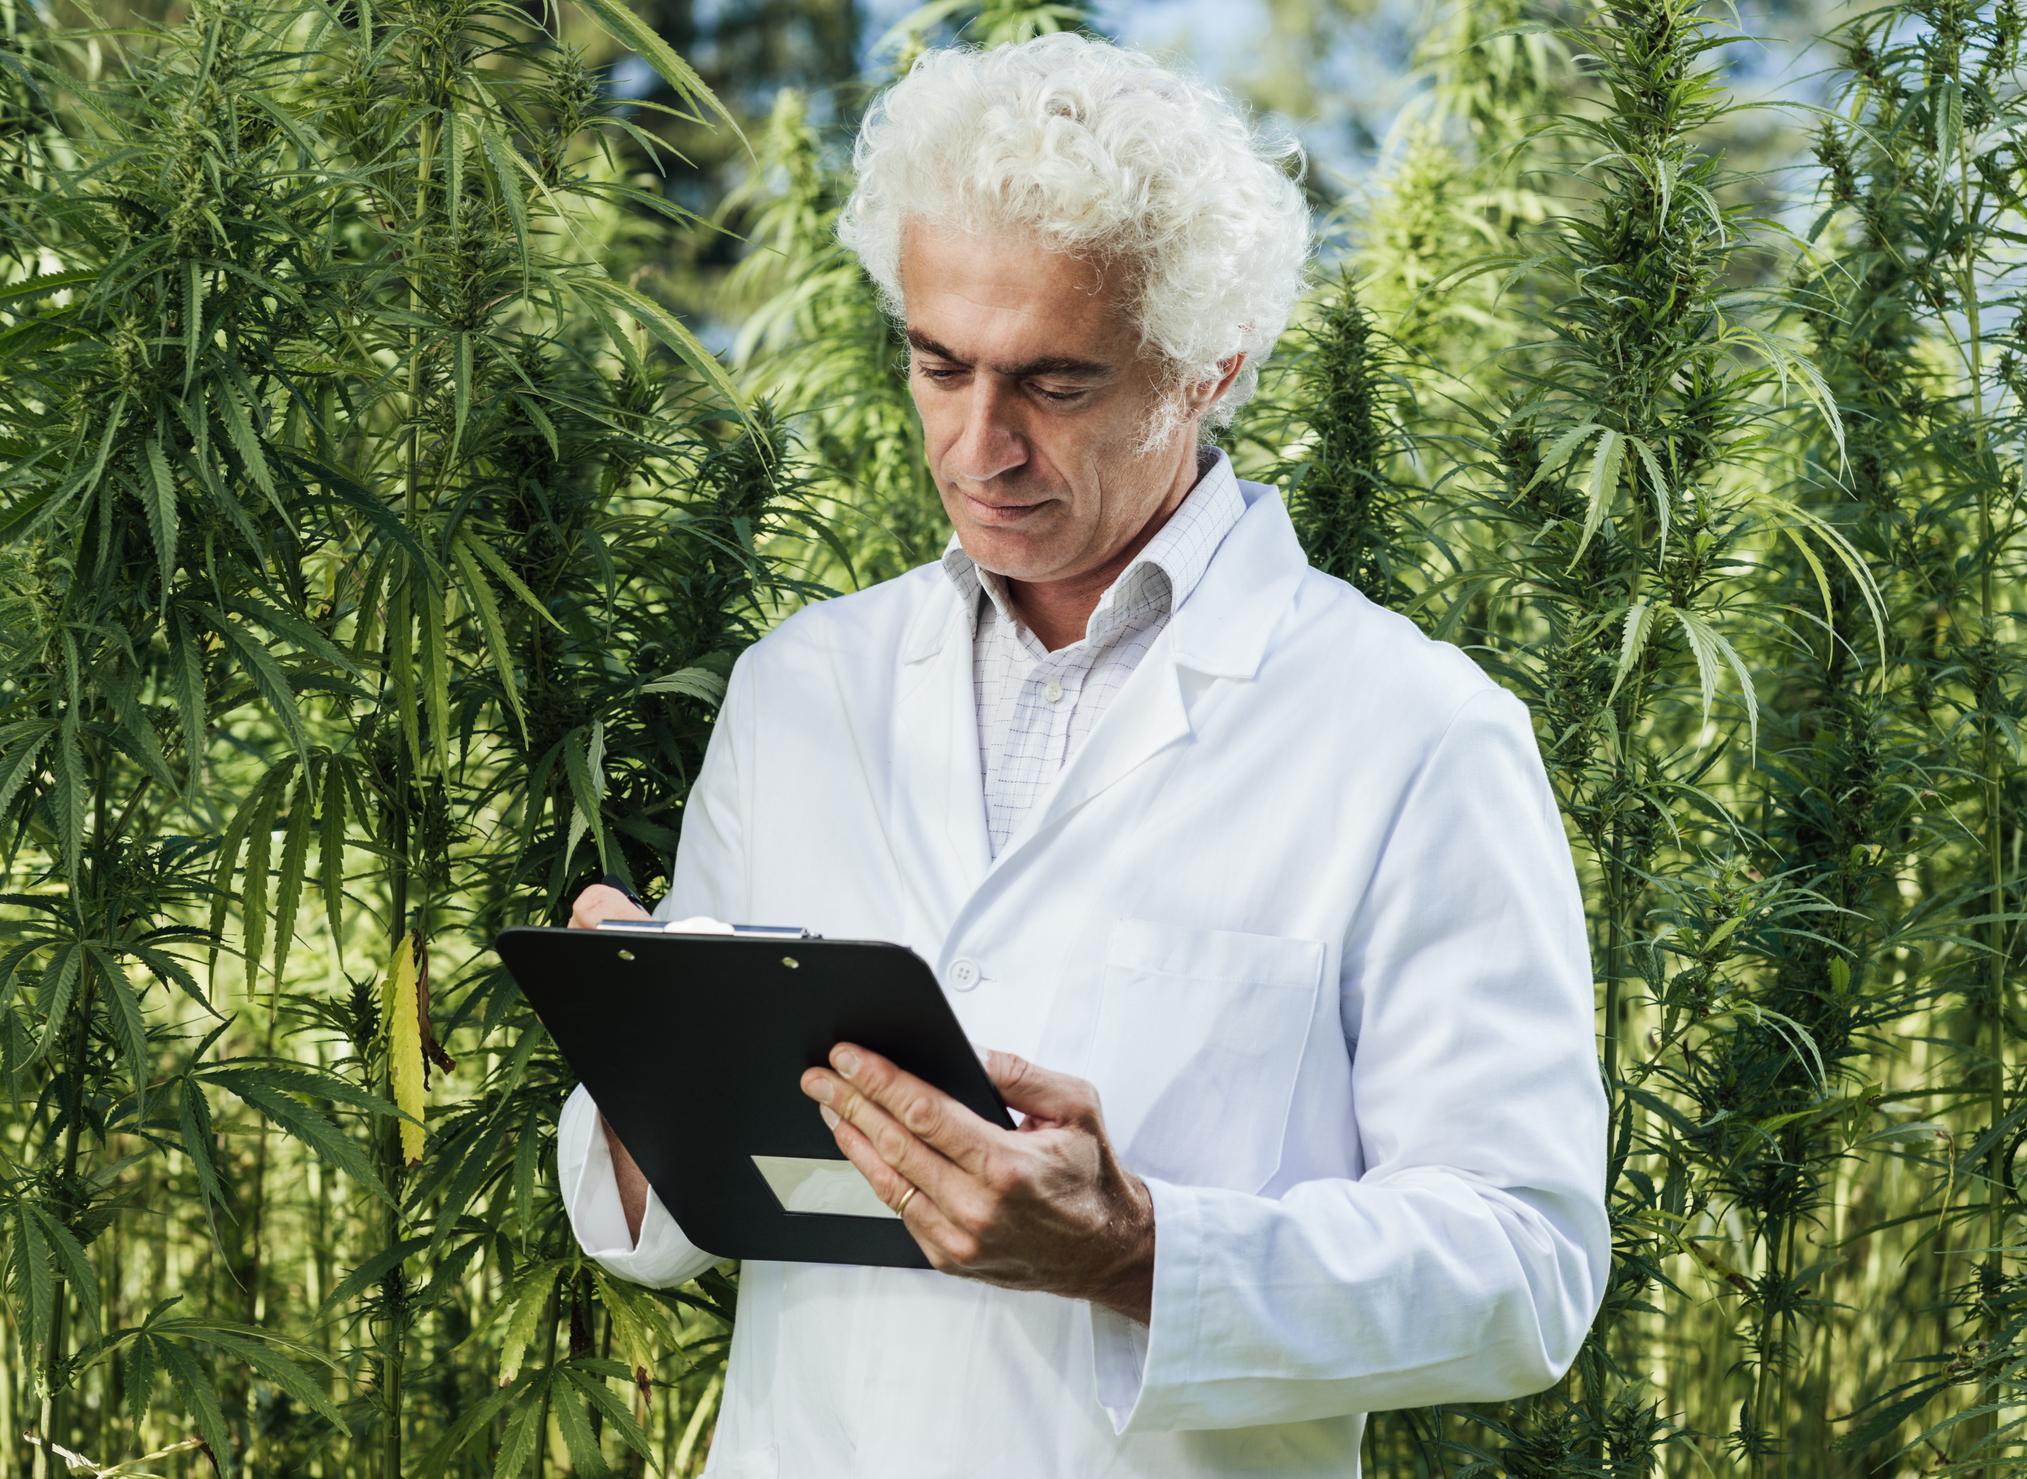 Researcher studying marijuana plants.